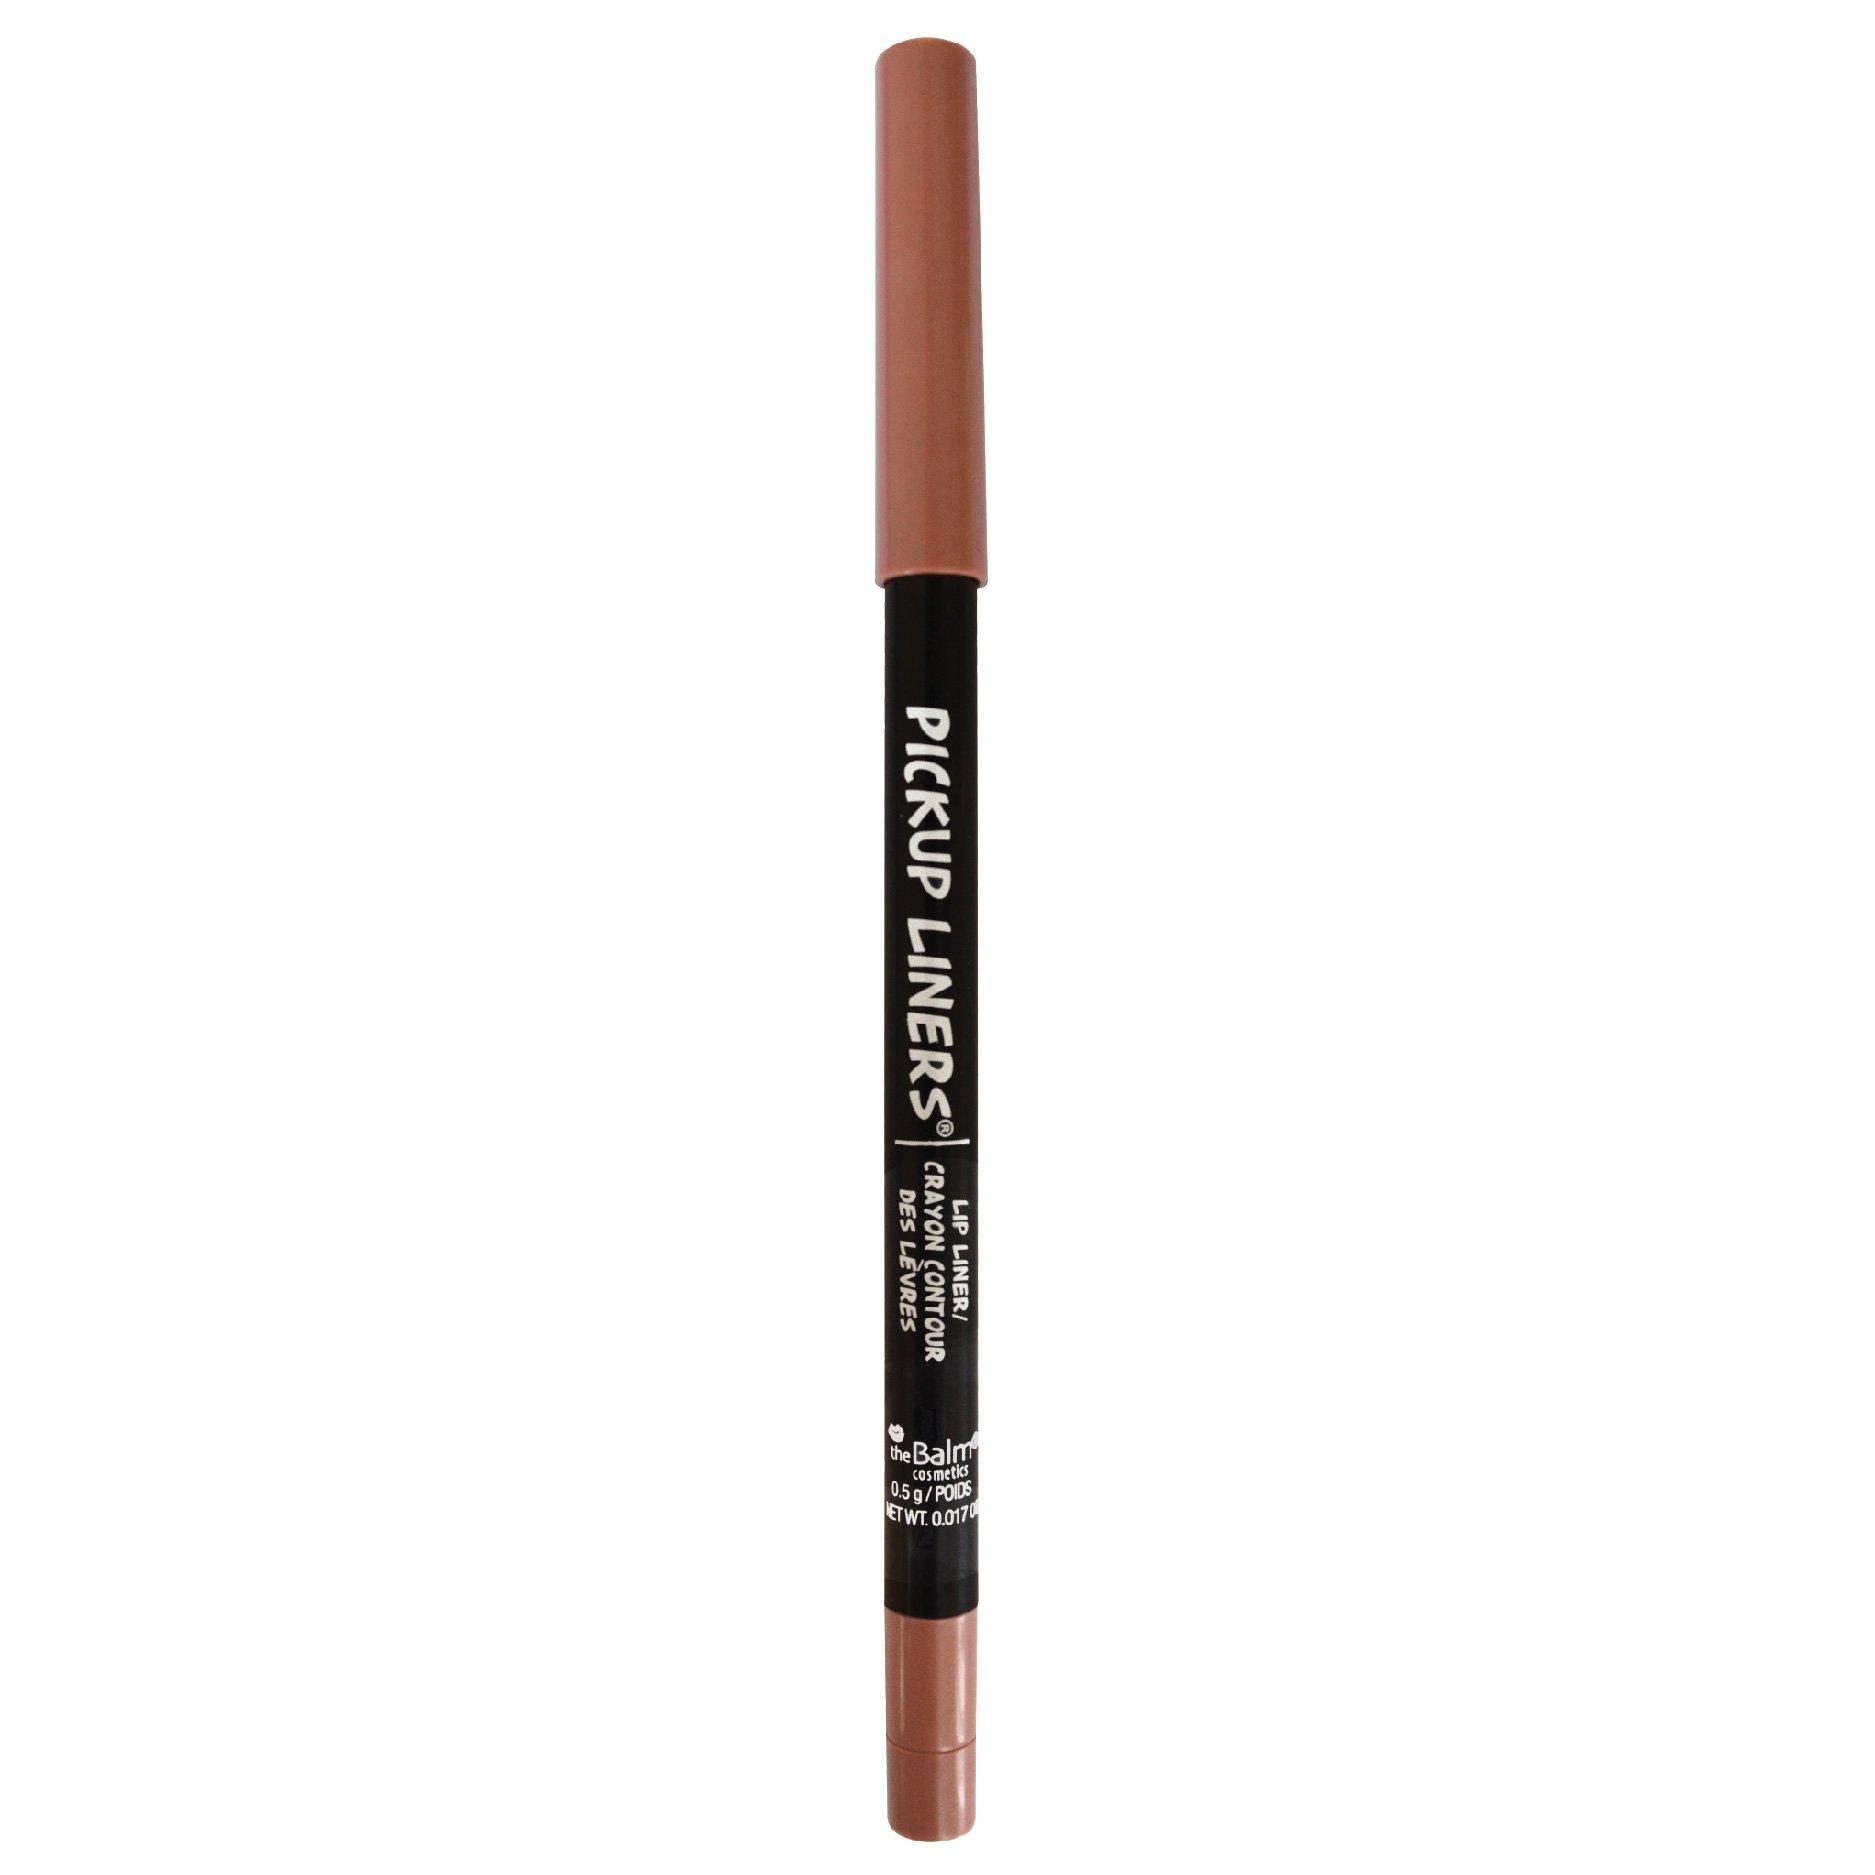 theBalm Pick Up Lip Liner - I Really Dig You, 0.017 oz